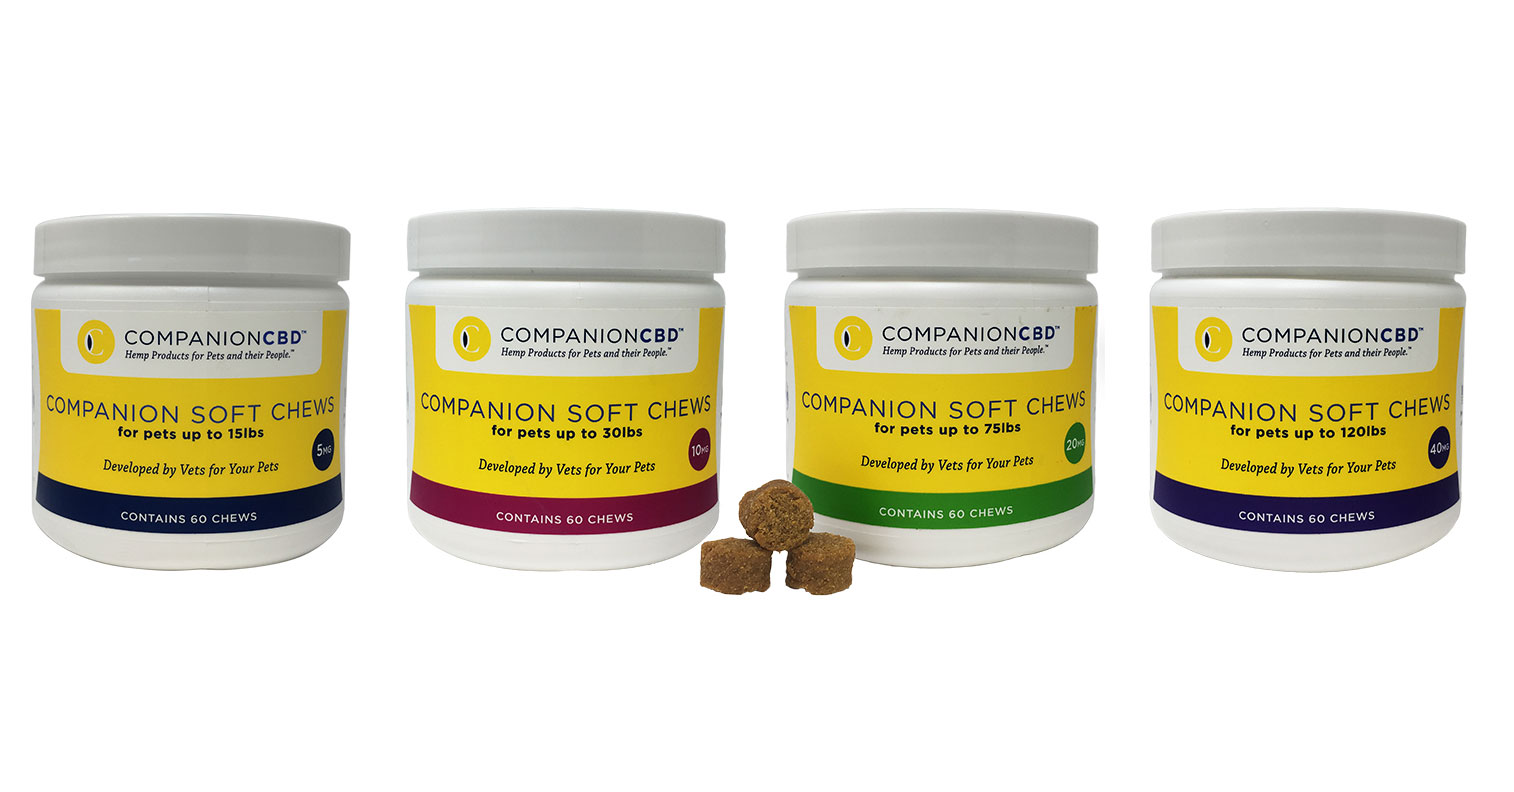 Veterinarian launches cannabidiol soft chews for pets